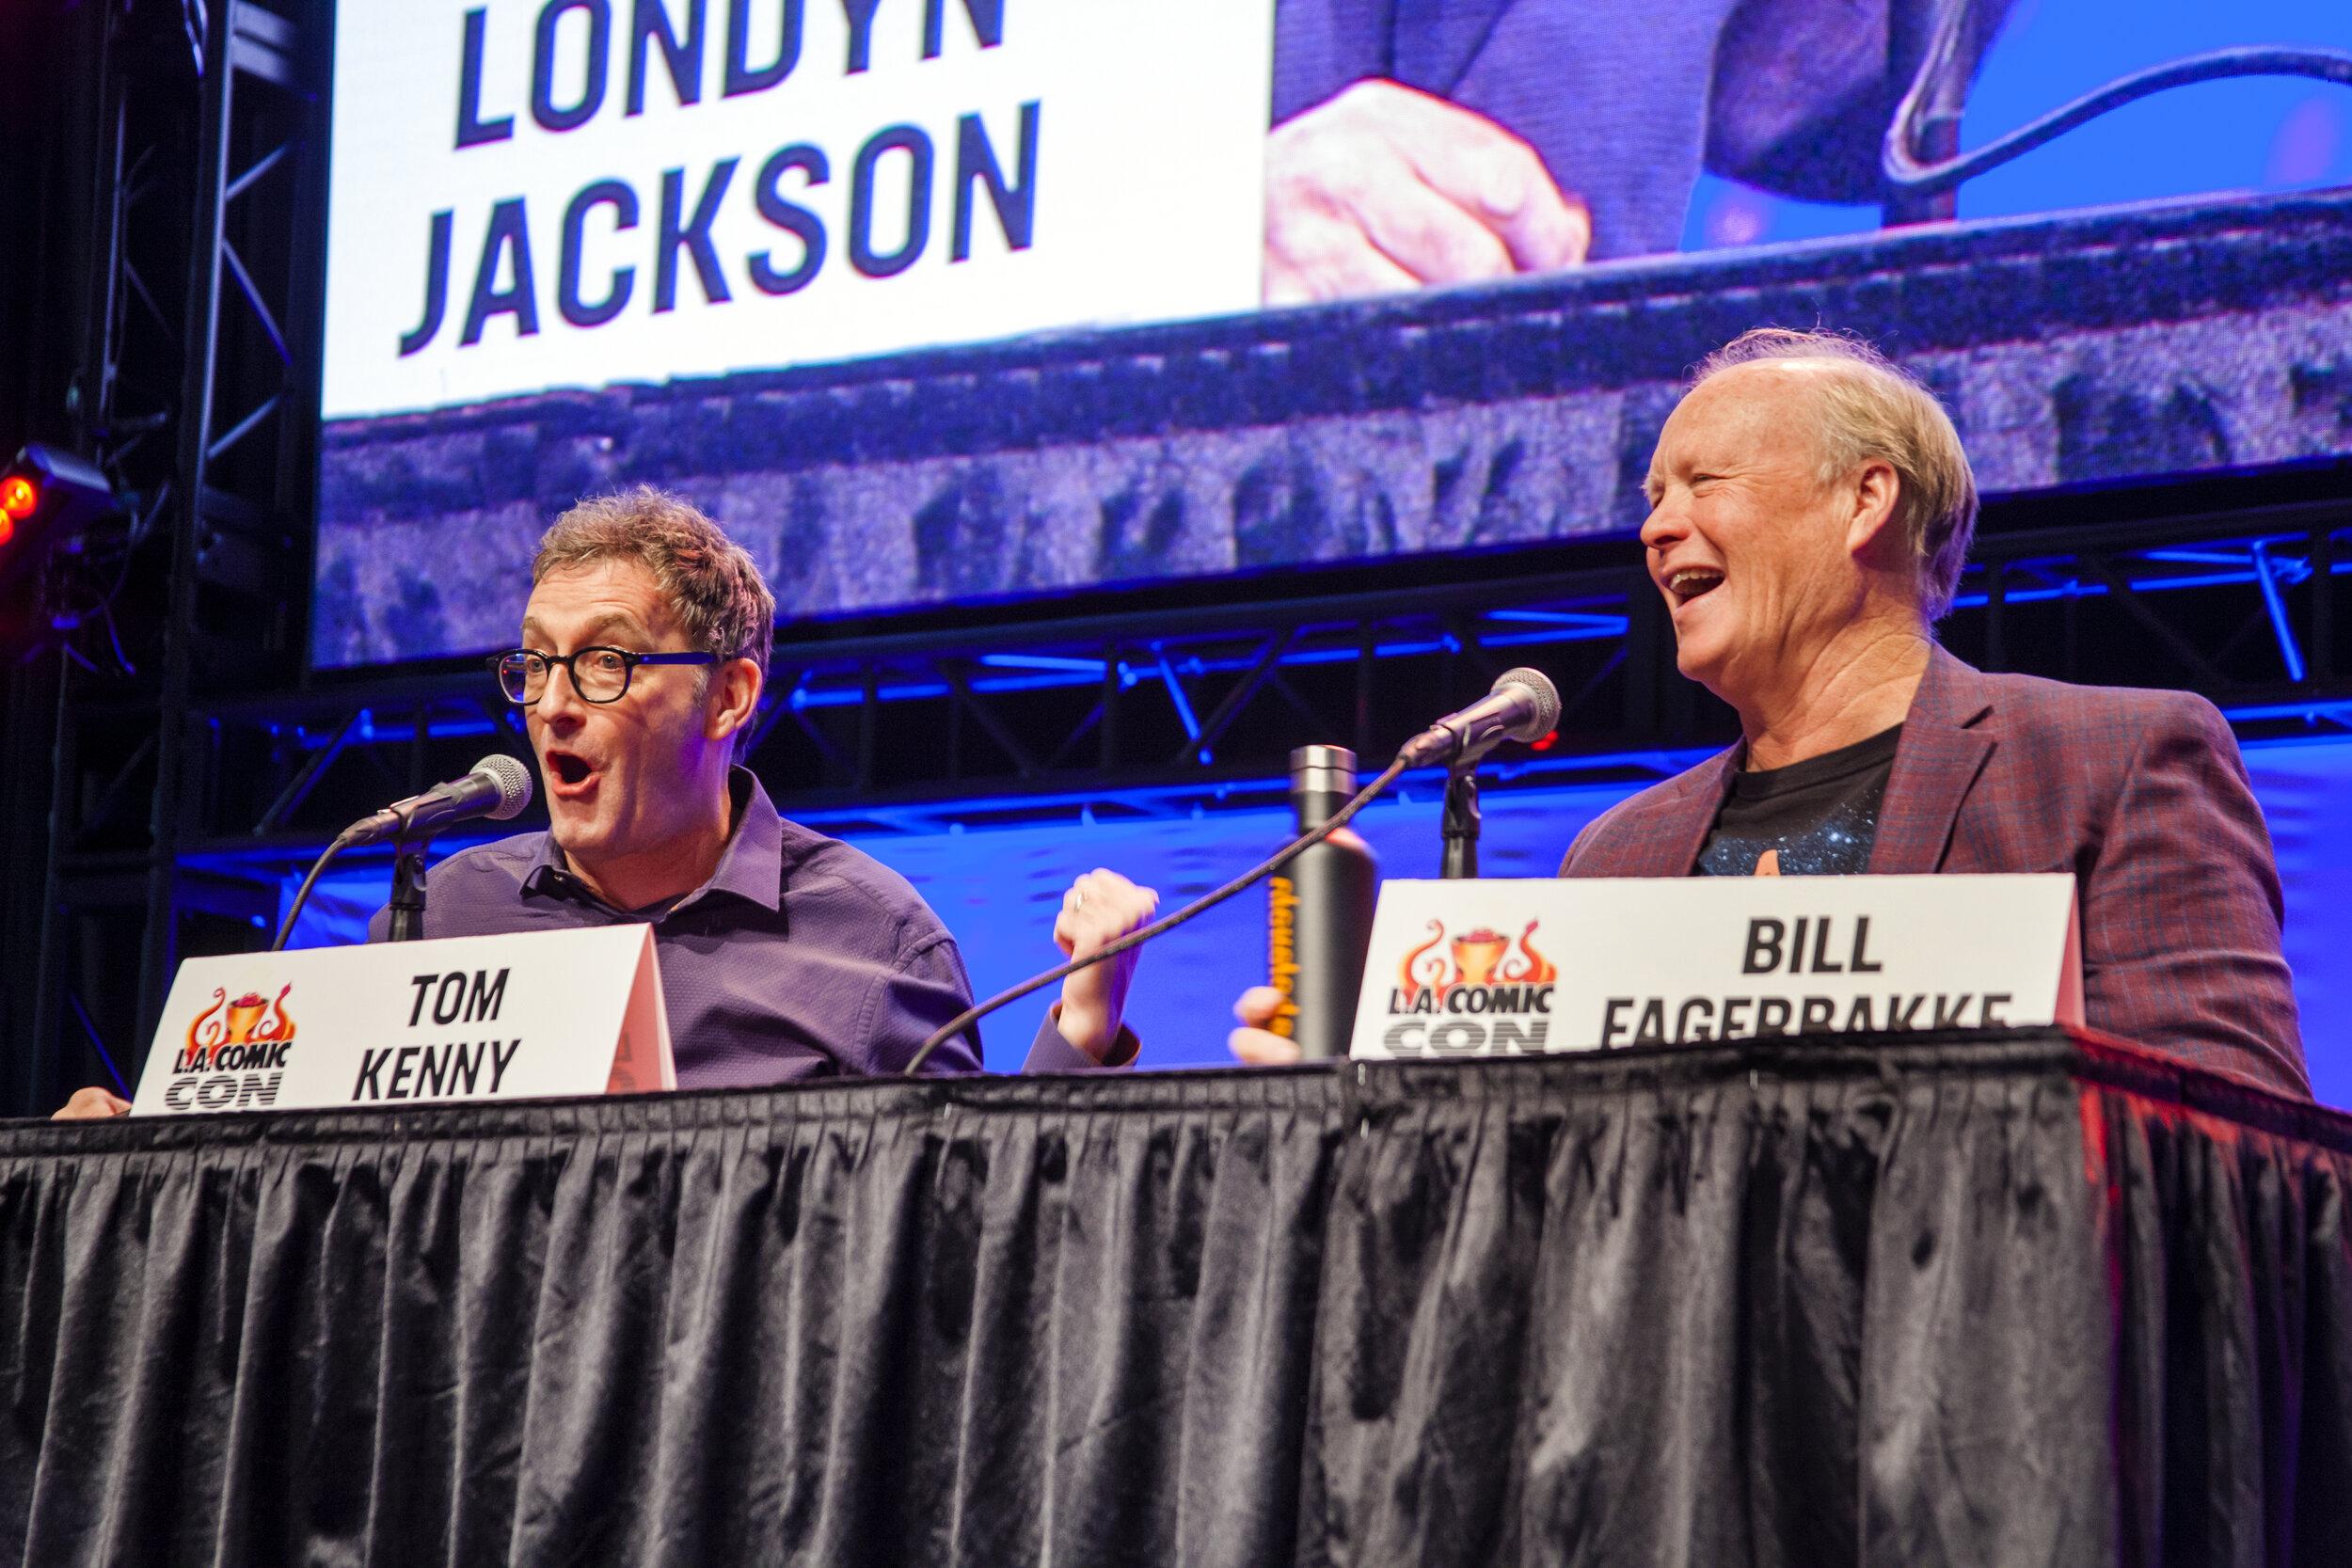 Tom Kenny (Spongebob) and Bill Fagerbakke (Patrick) at LACC. Photo by Joel Feria